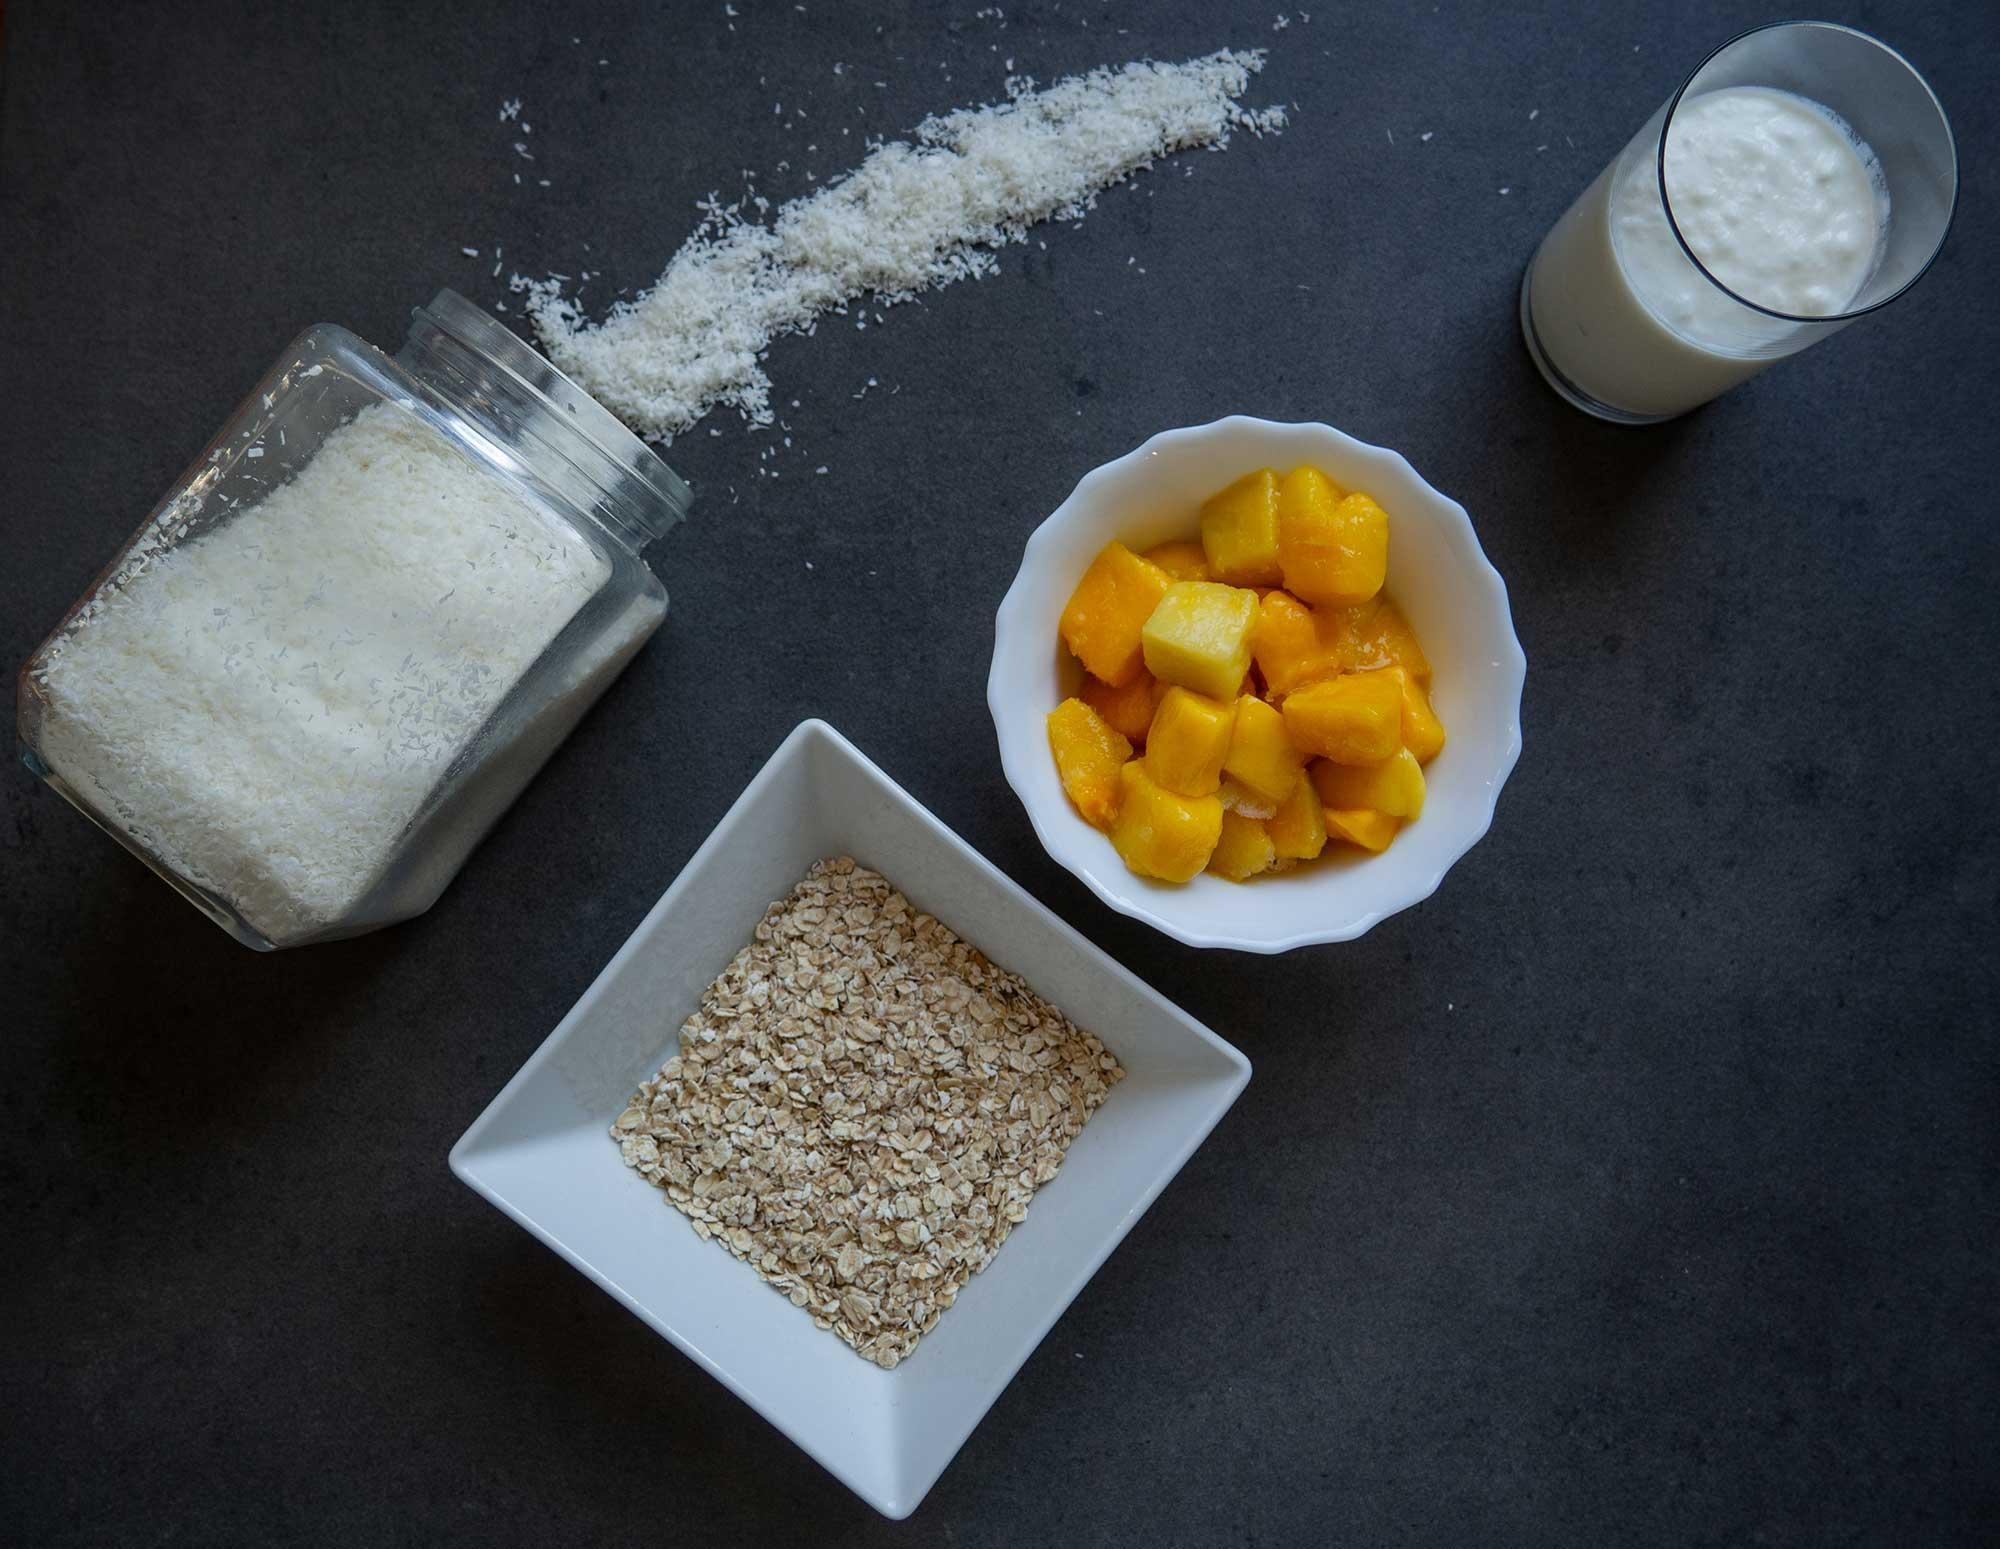 mango, oat flakes, coconut flakes, natural yogurt